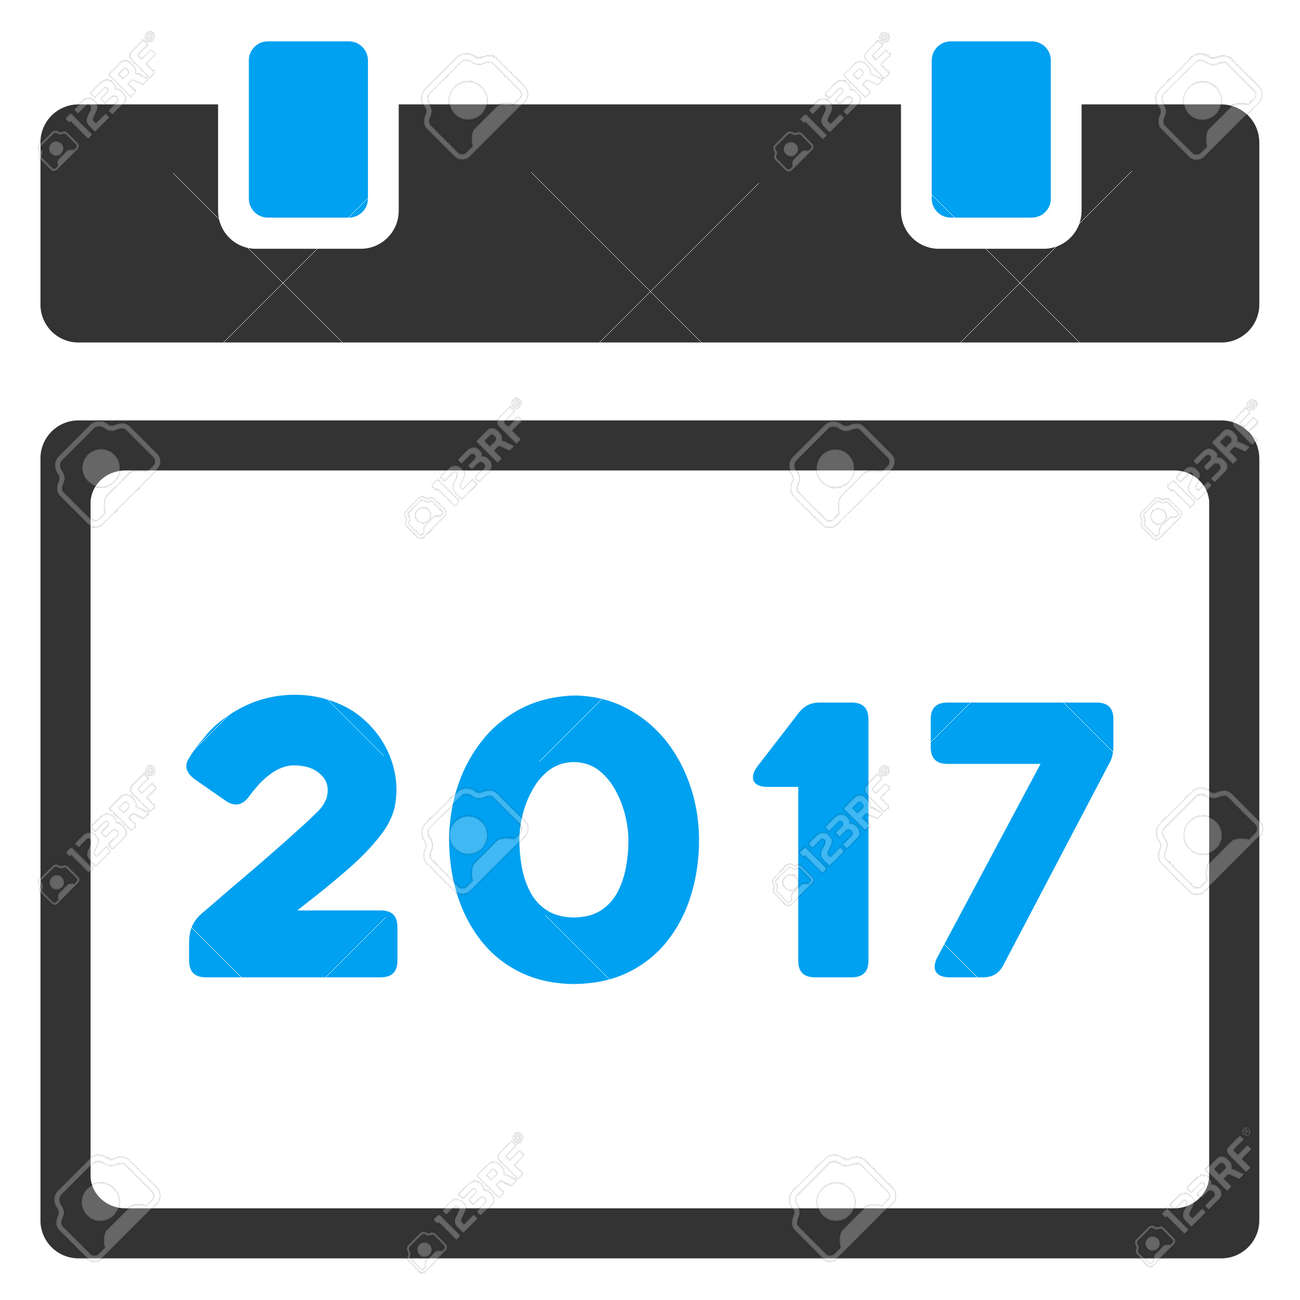 2017 calendar icon vector style is flat iconic symbol on a white rh 123rf com icon vector calendar calendar icon vector free